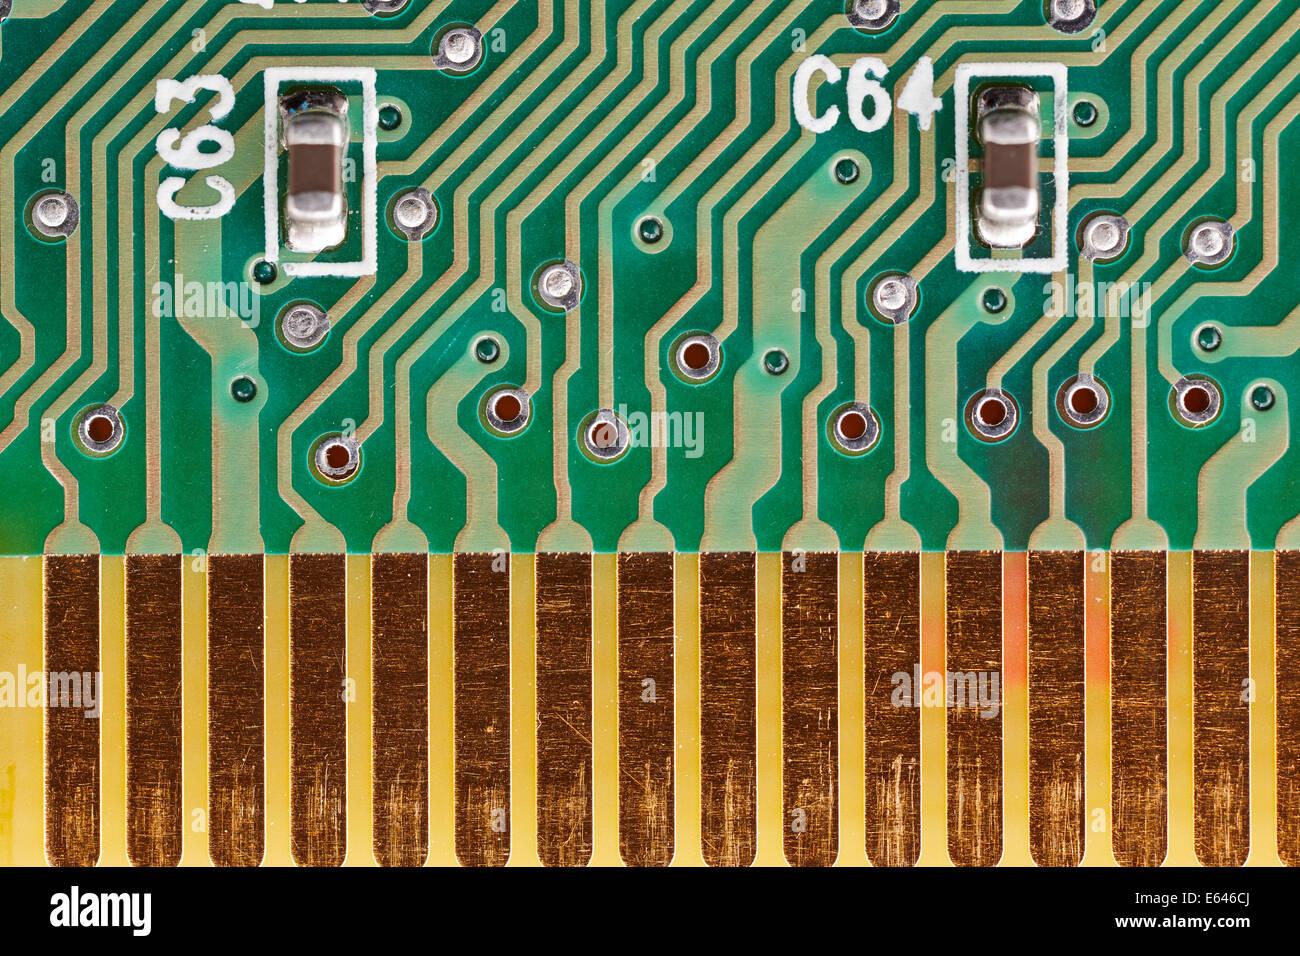 Printed circuit board close up detail. - Stock Image